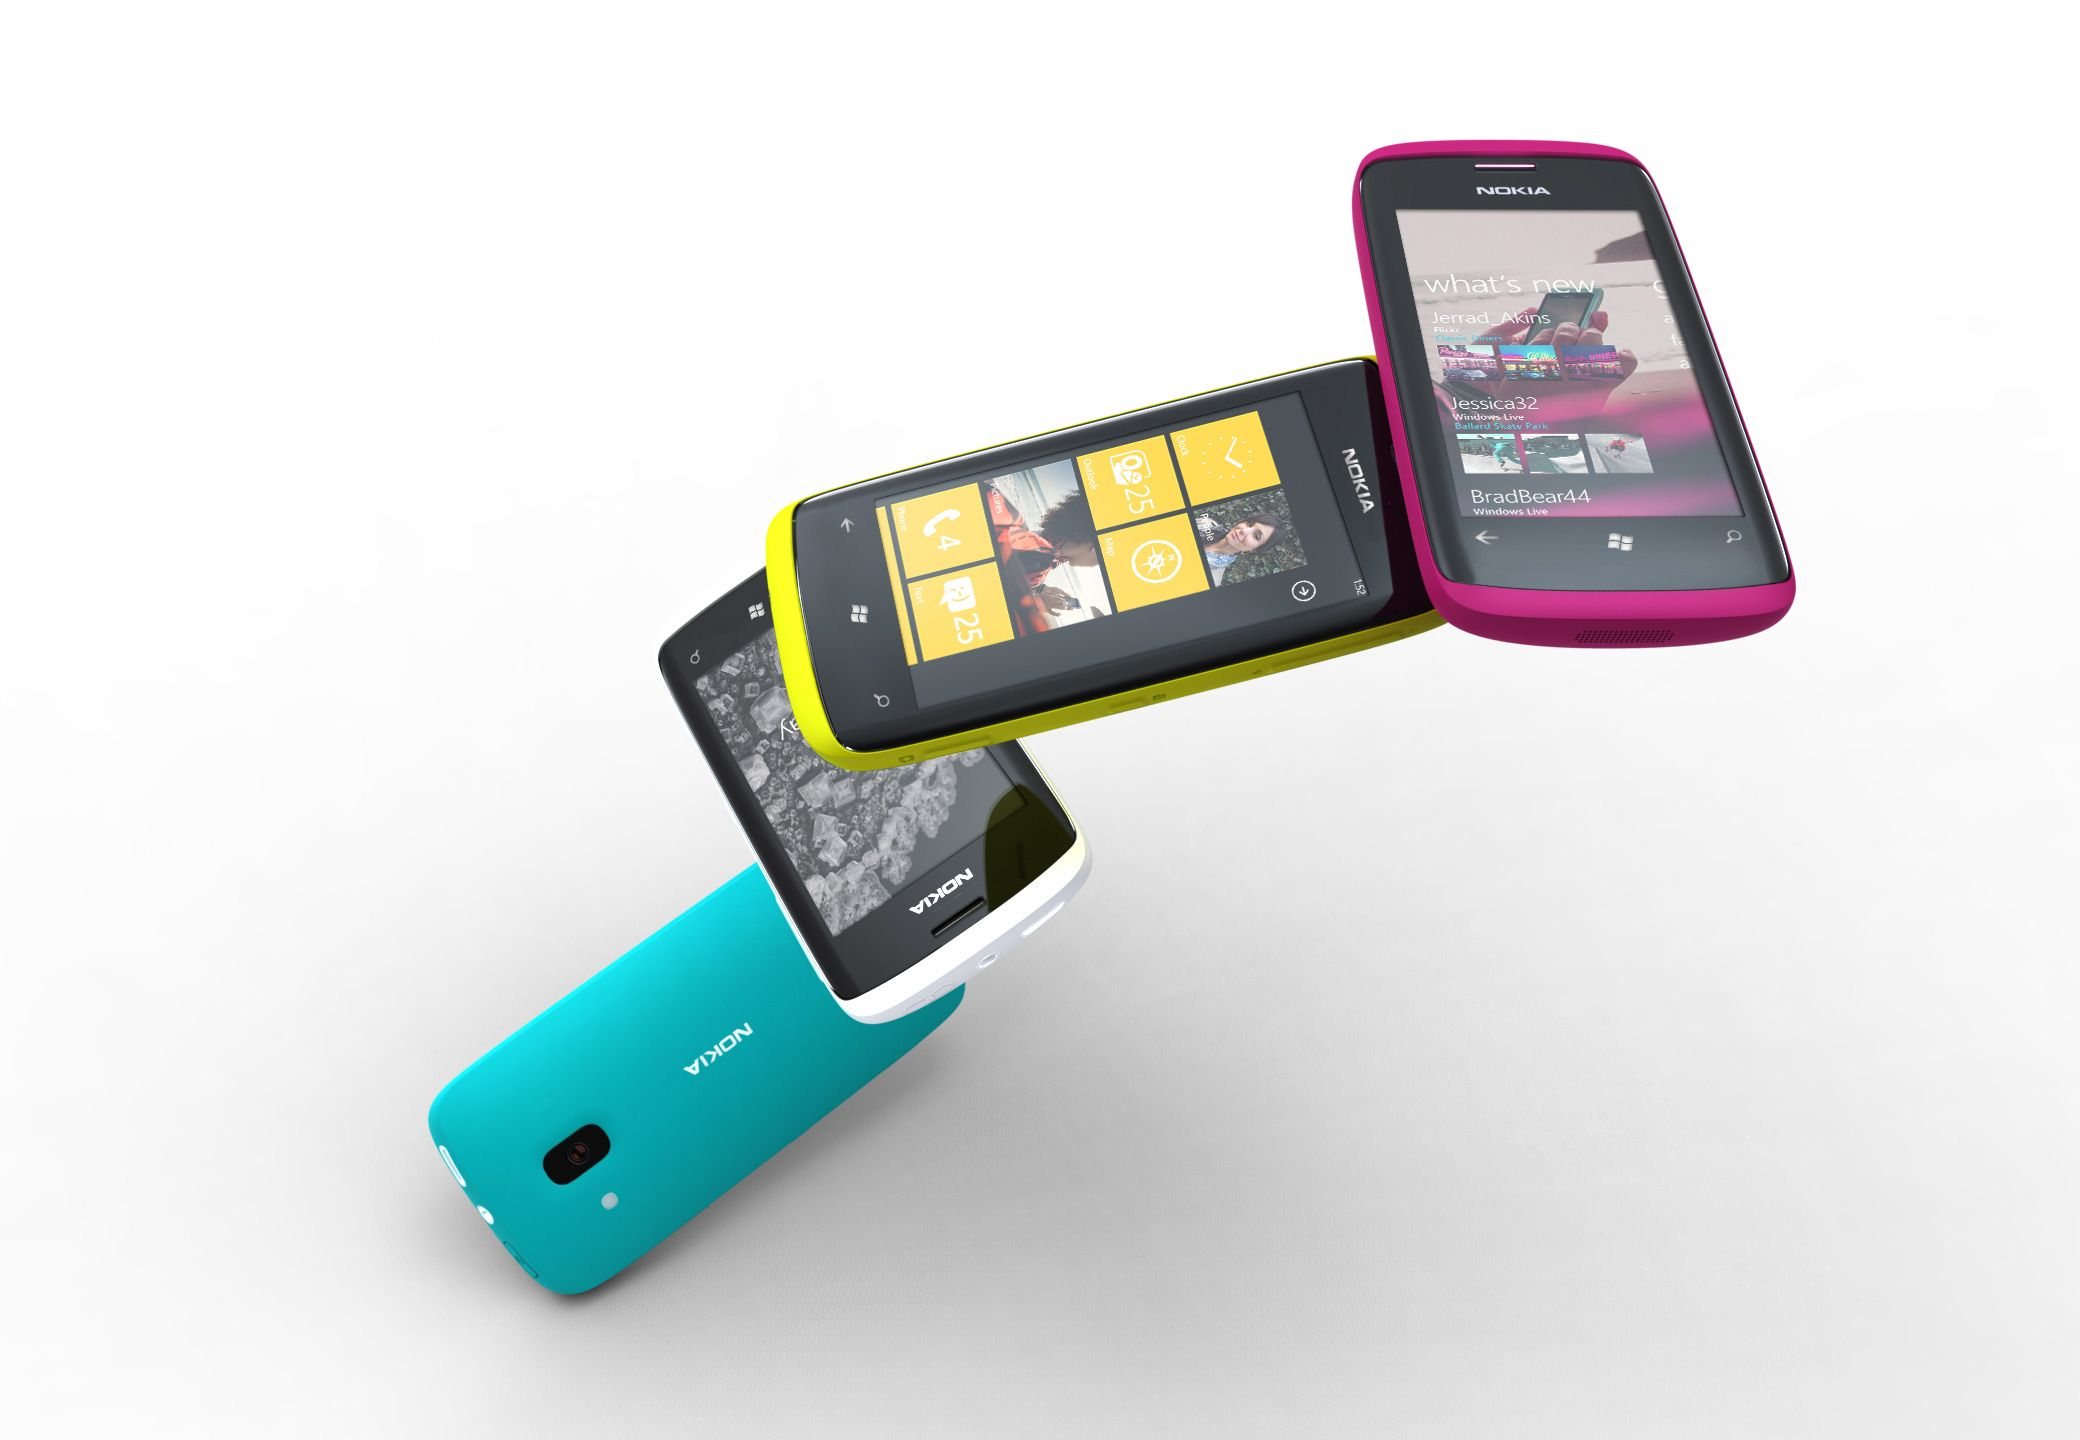 Nokia finally unveils not one but two windows phones the lumia 800 - Concept Nokia Windows Phones 12